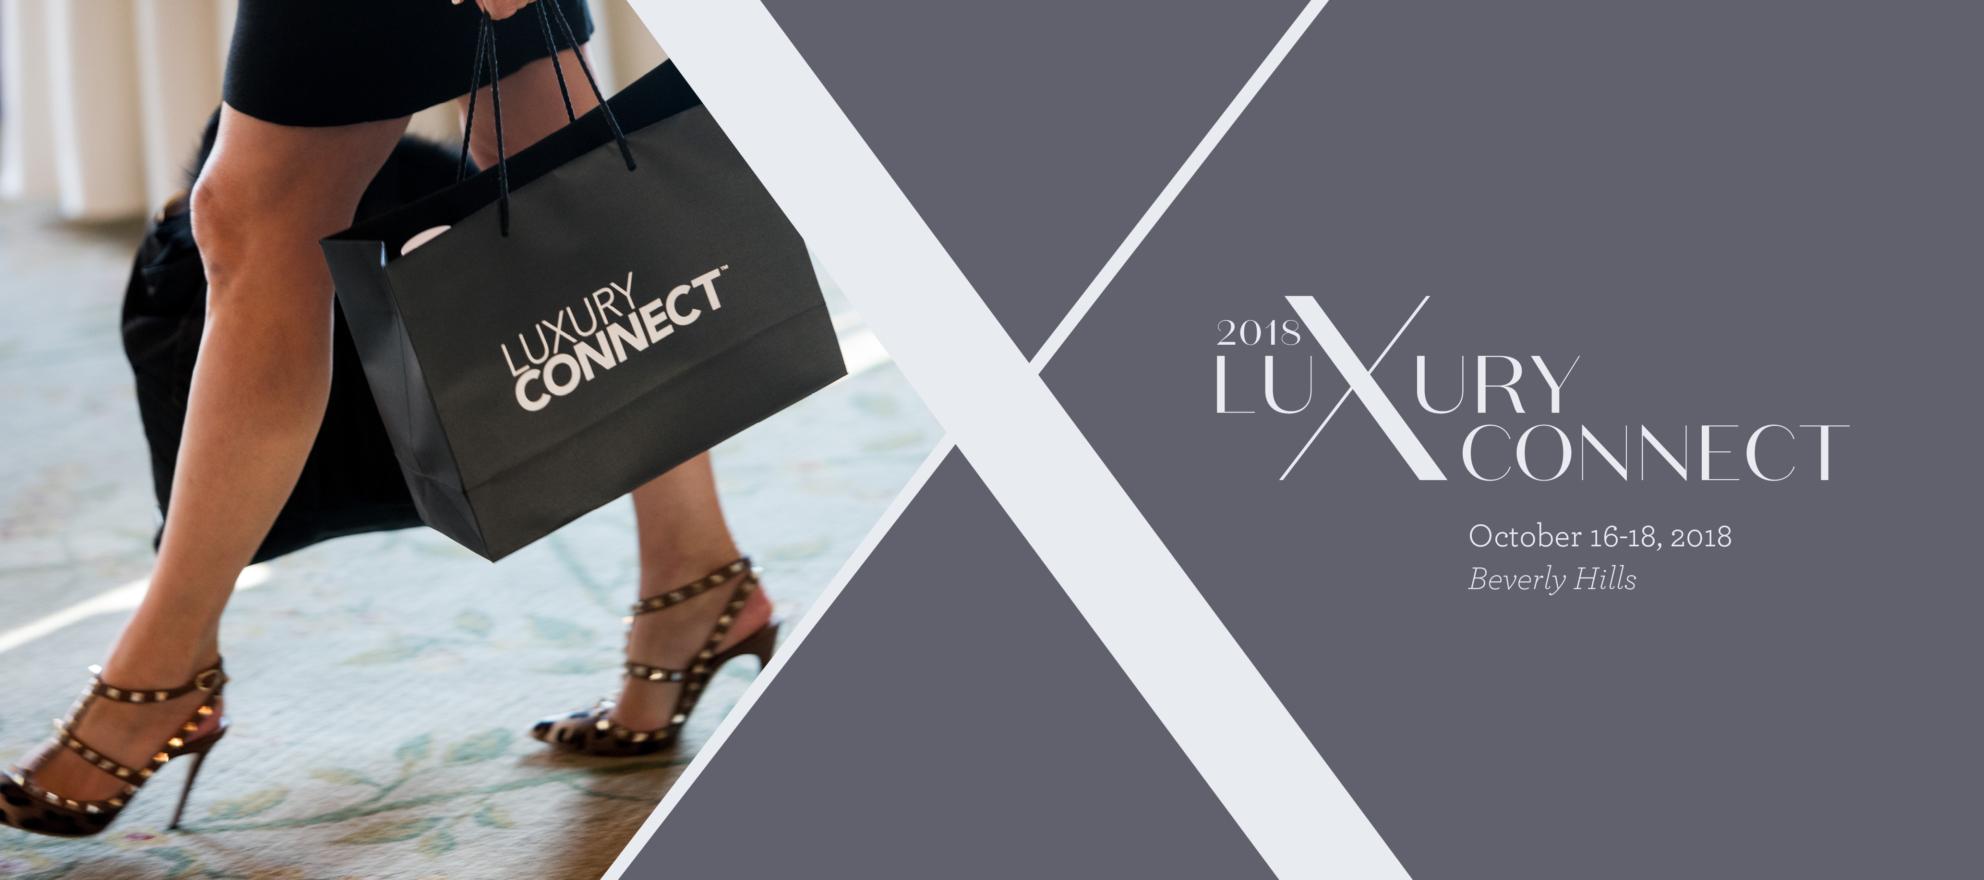 luxury connect celebrity stylist